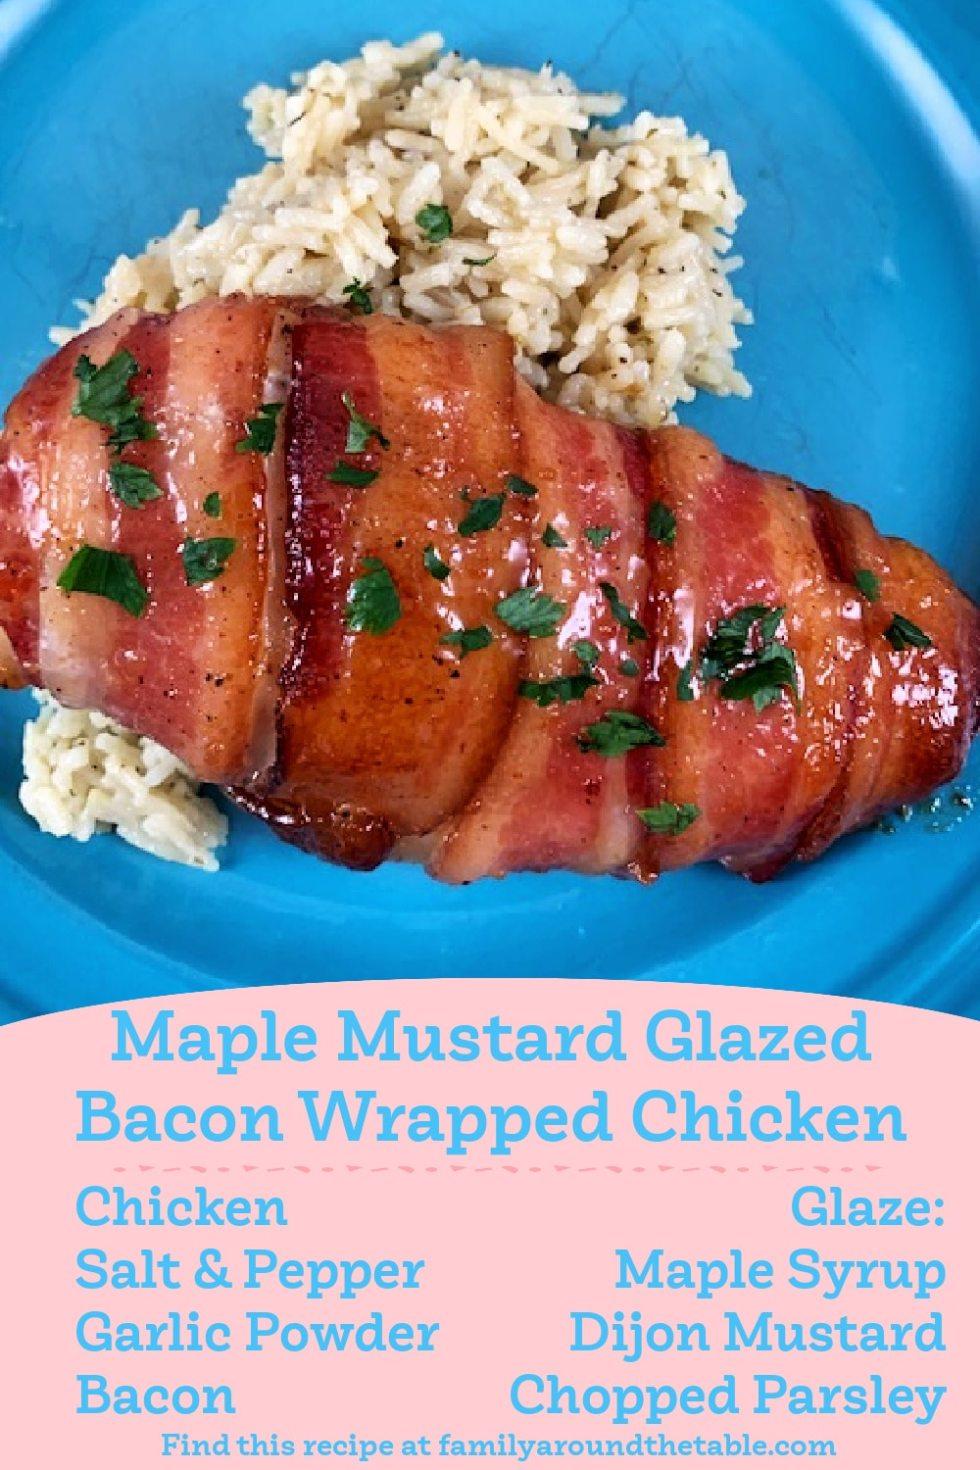 Maple Mustard Glazed Bacon Wrapped Chicken